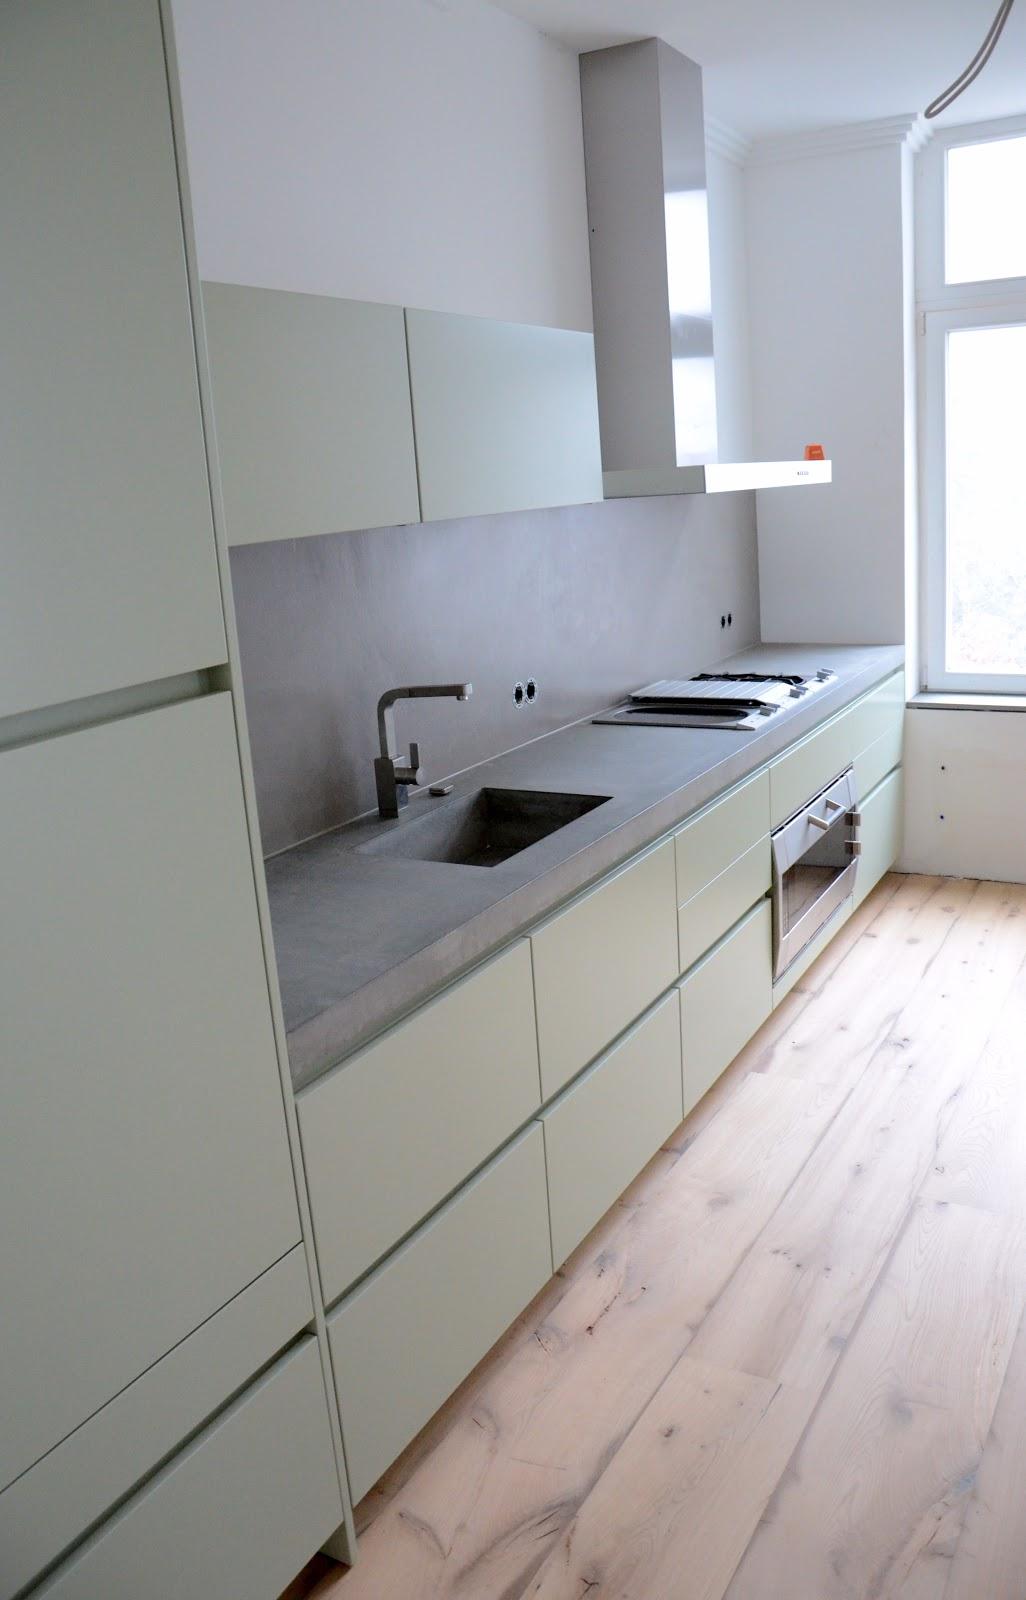 beton cire oberfl chen in beton look november 2012. Black Bedroom Furniture Sets. Home Design Ideas